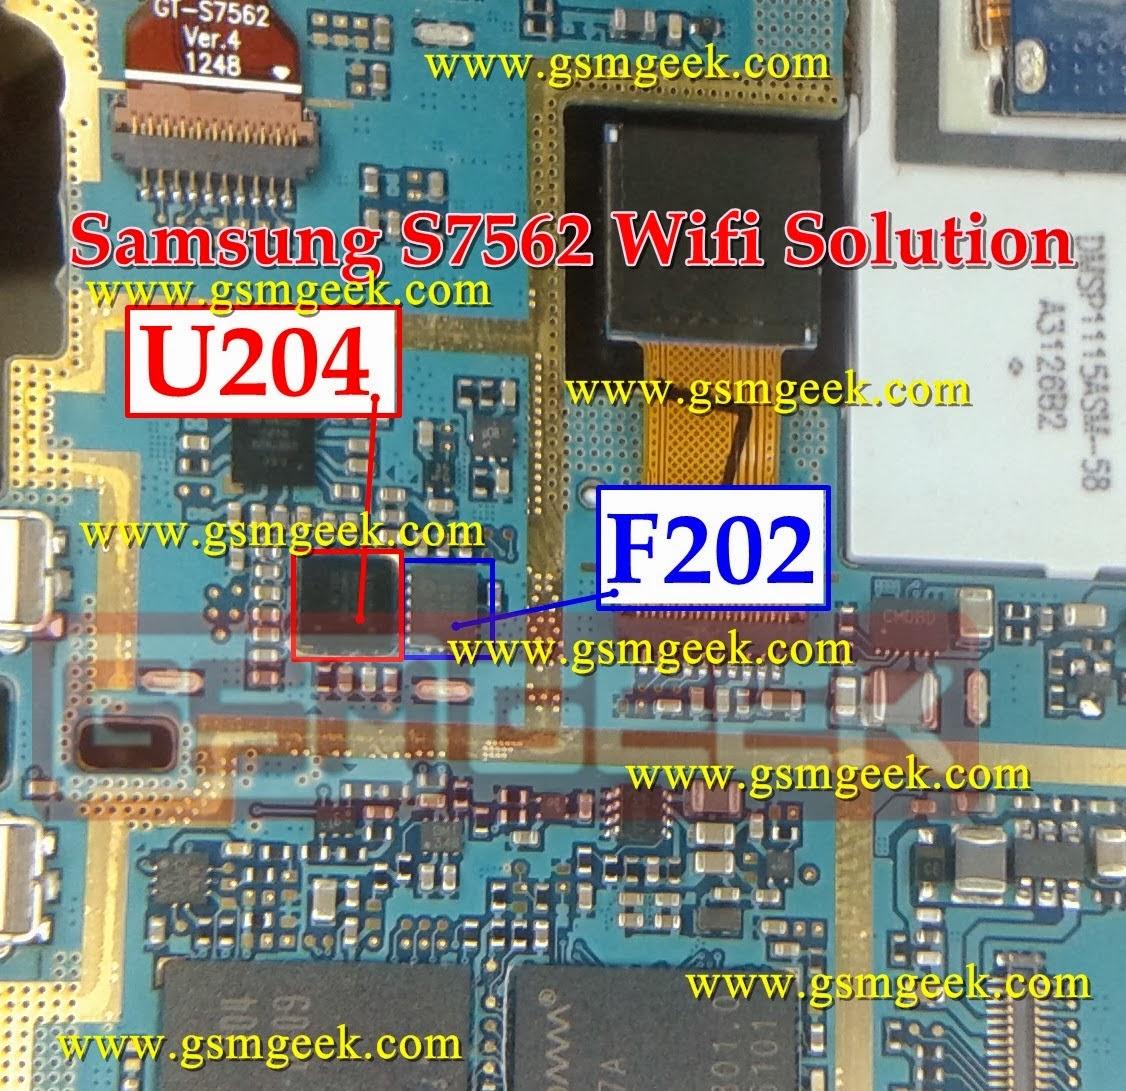 Samsung Galaxy S Duos S7562 Wi